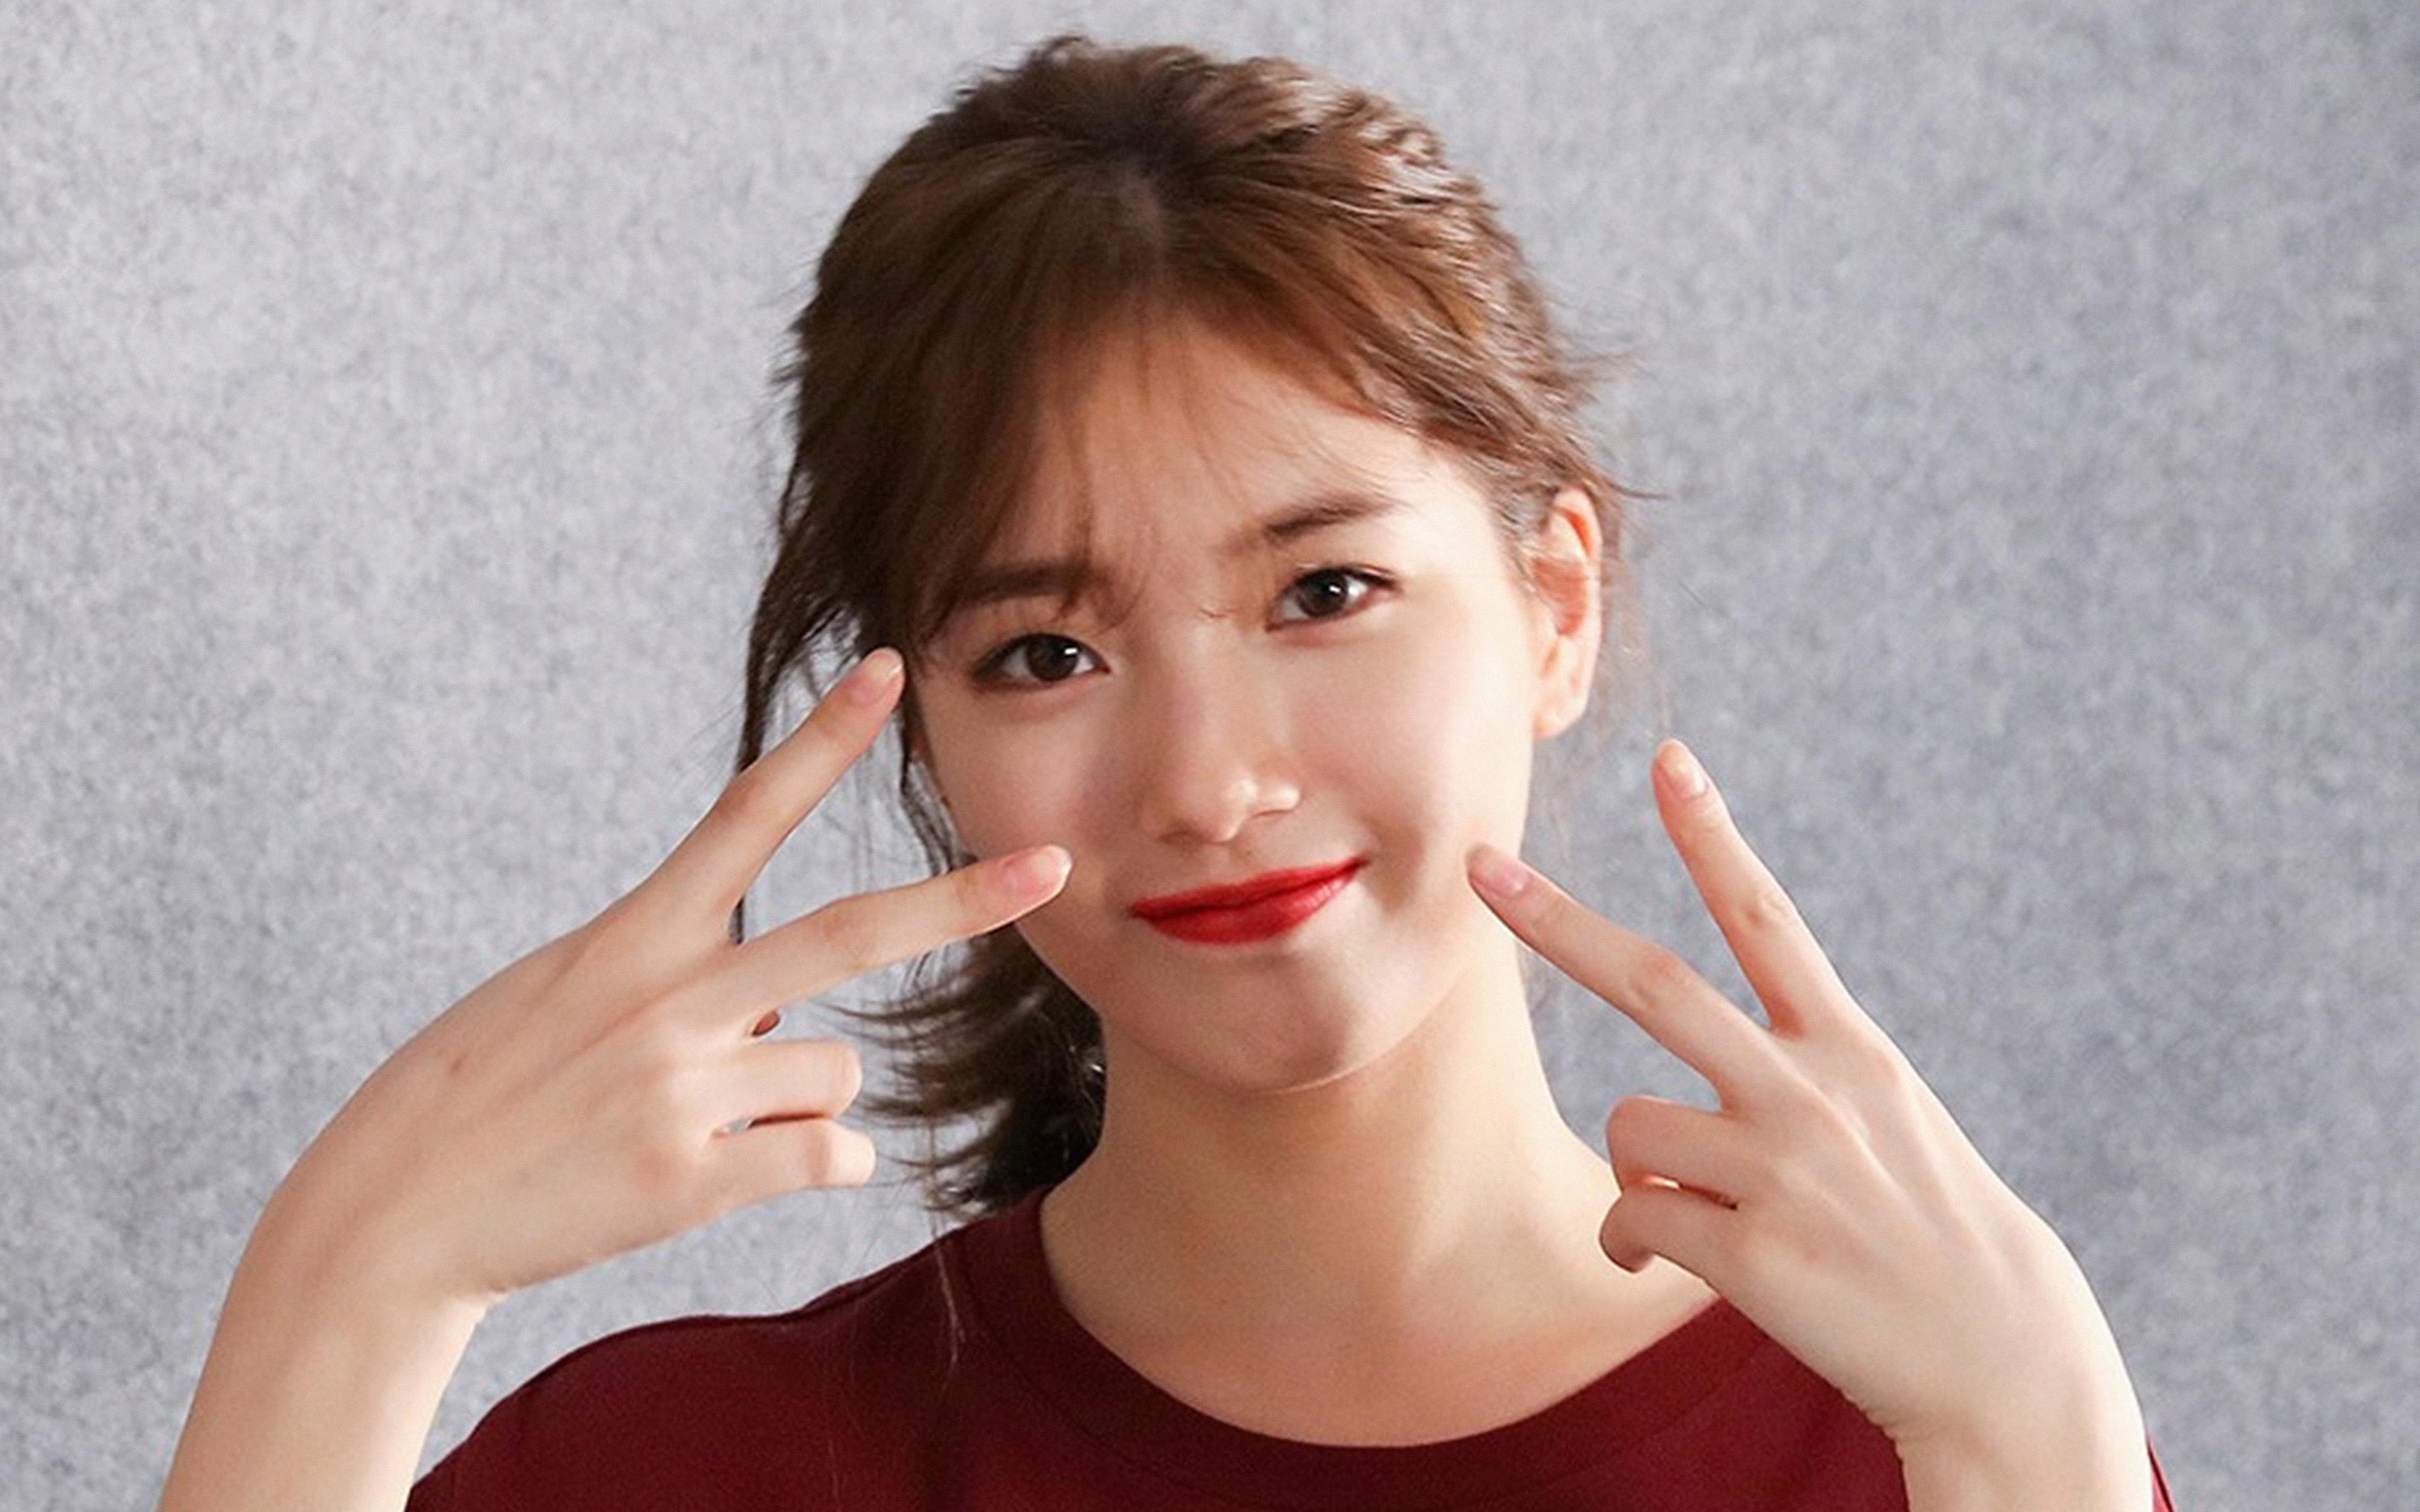 hn16-girl-white-cute-asian-kpop-wallpaper